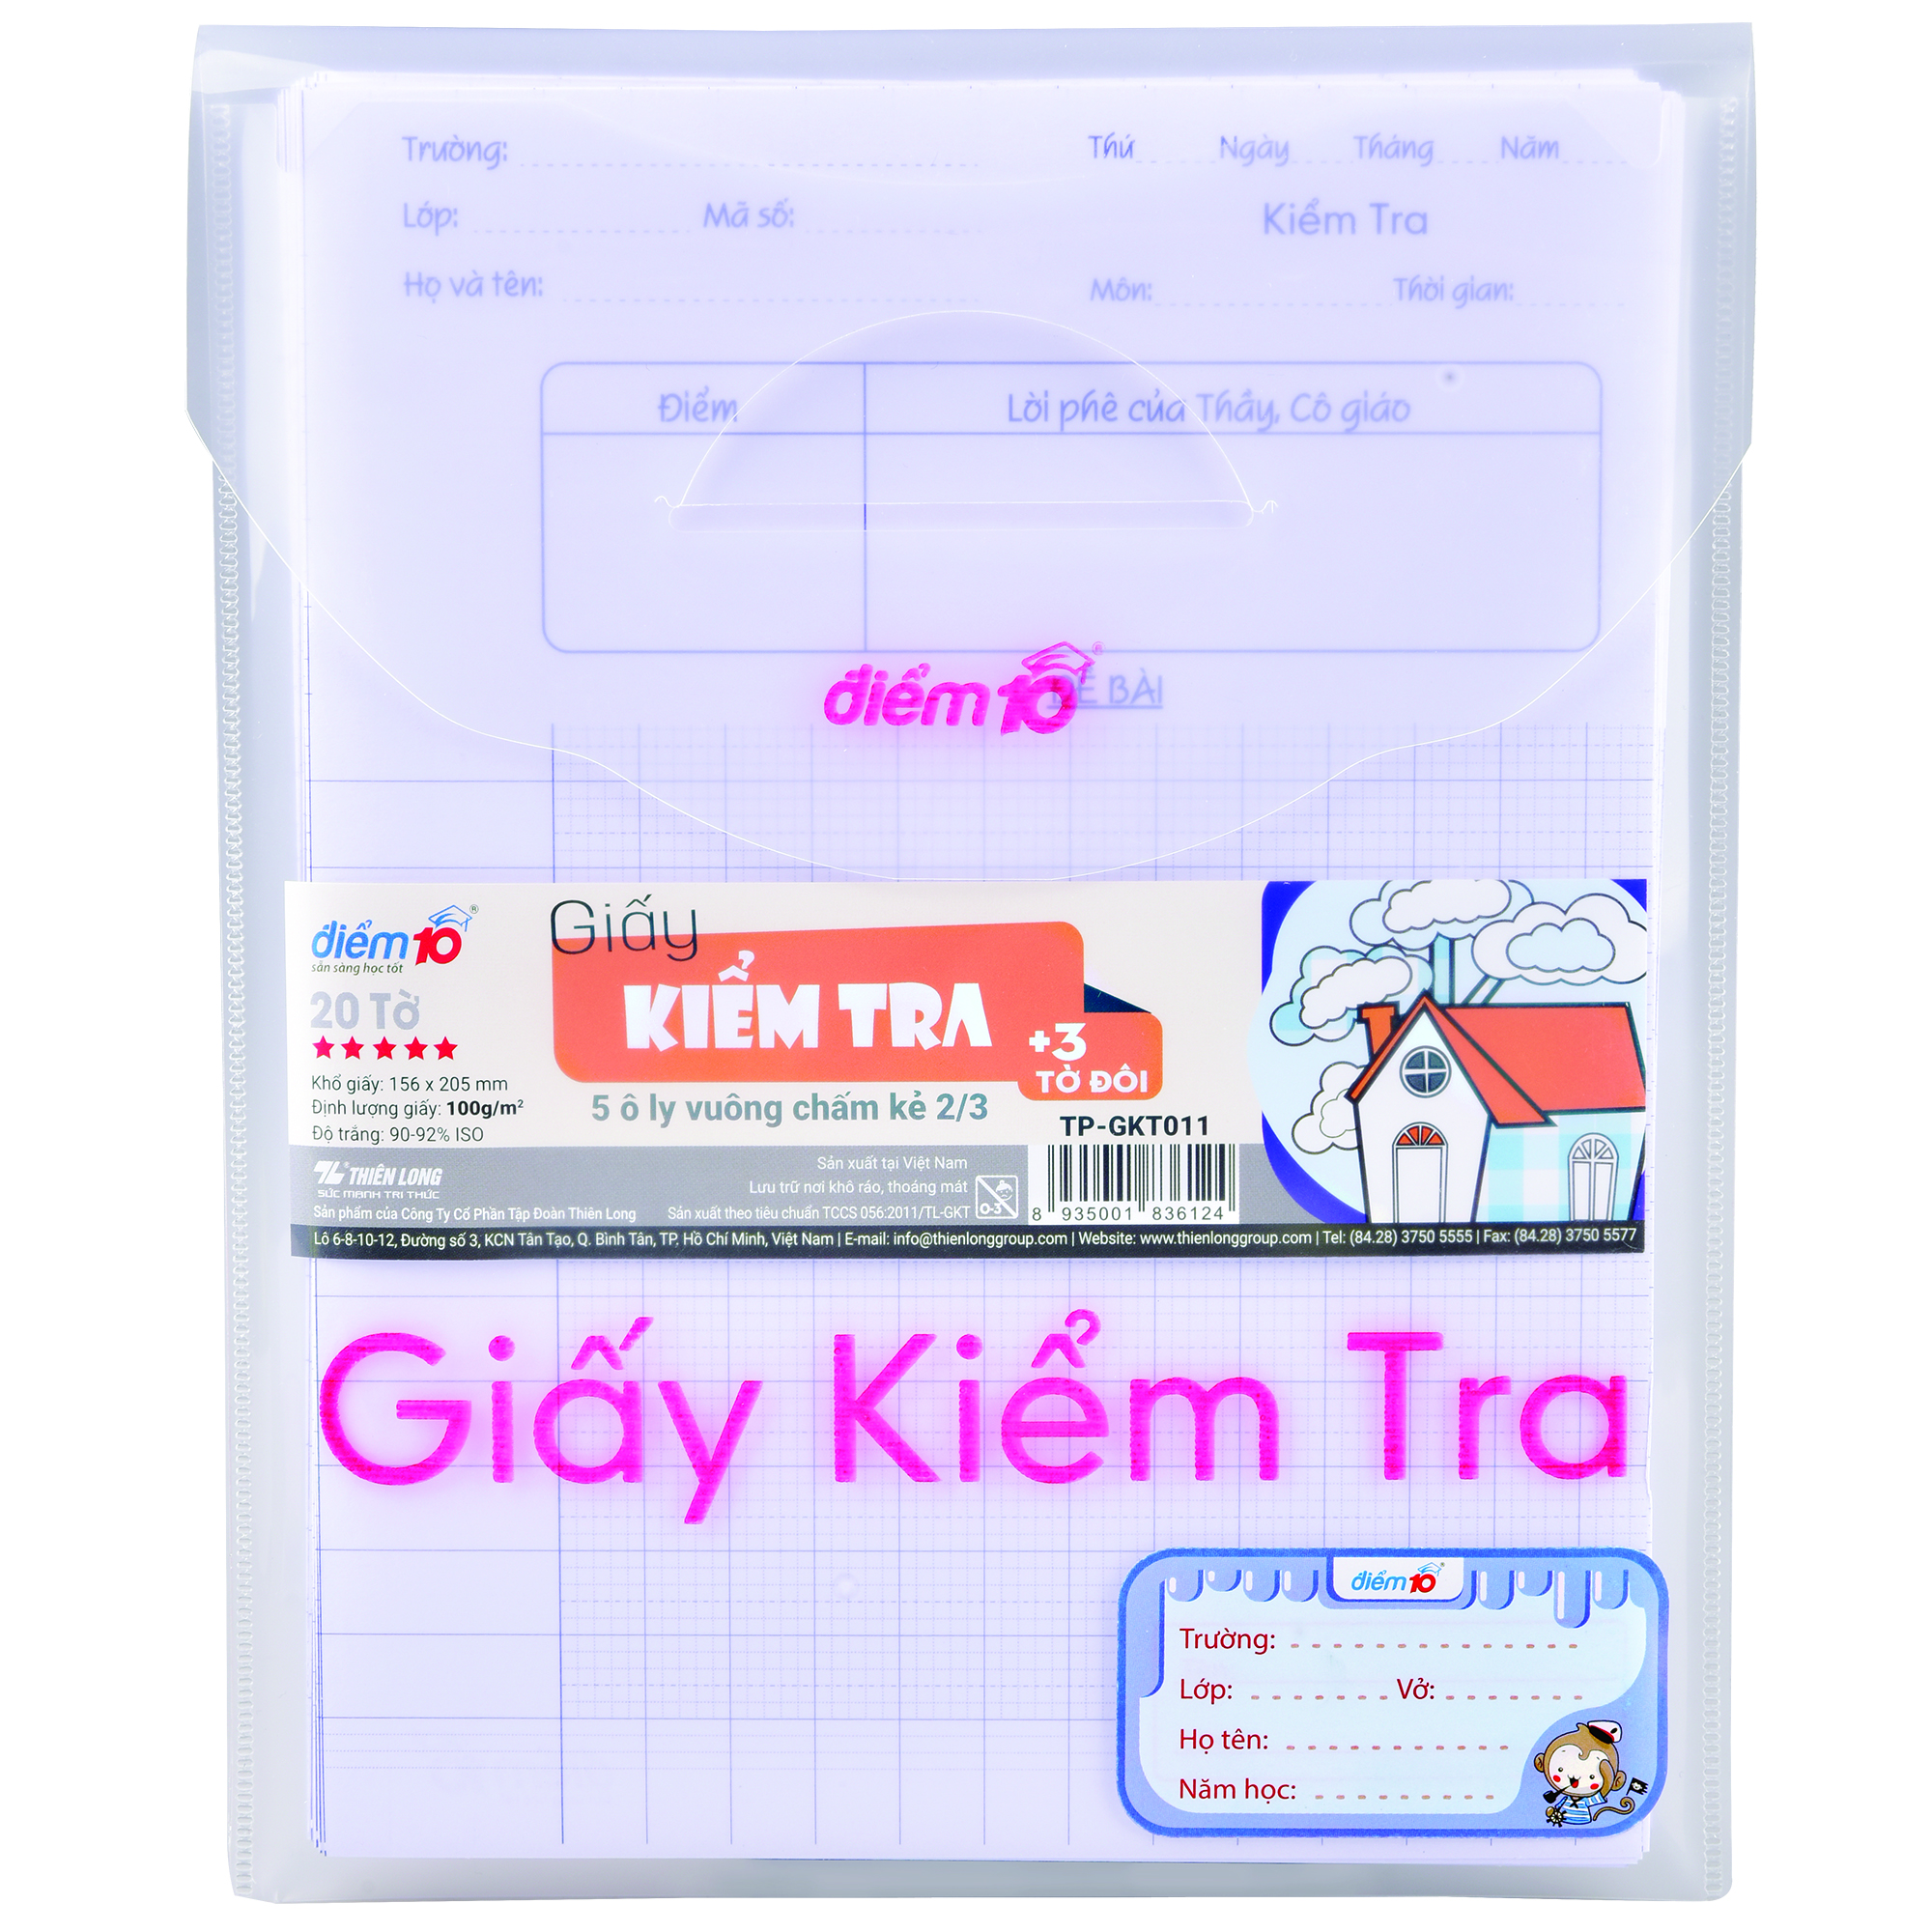 TP-GKT011